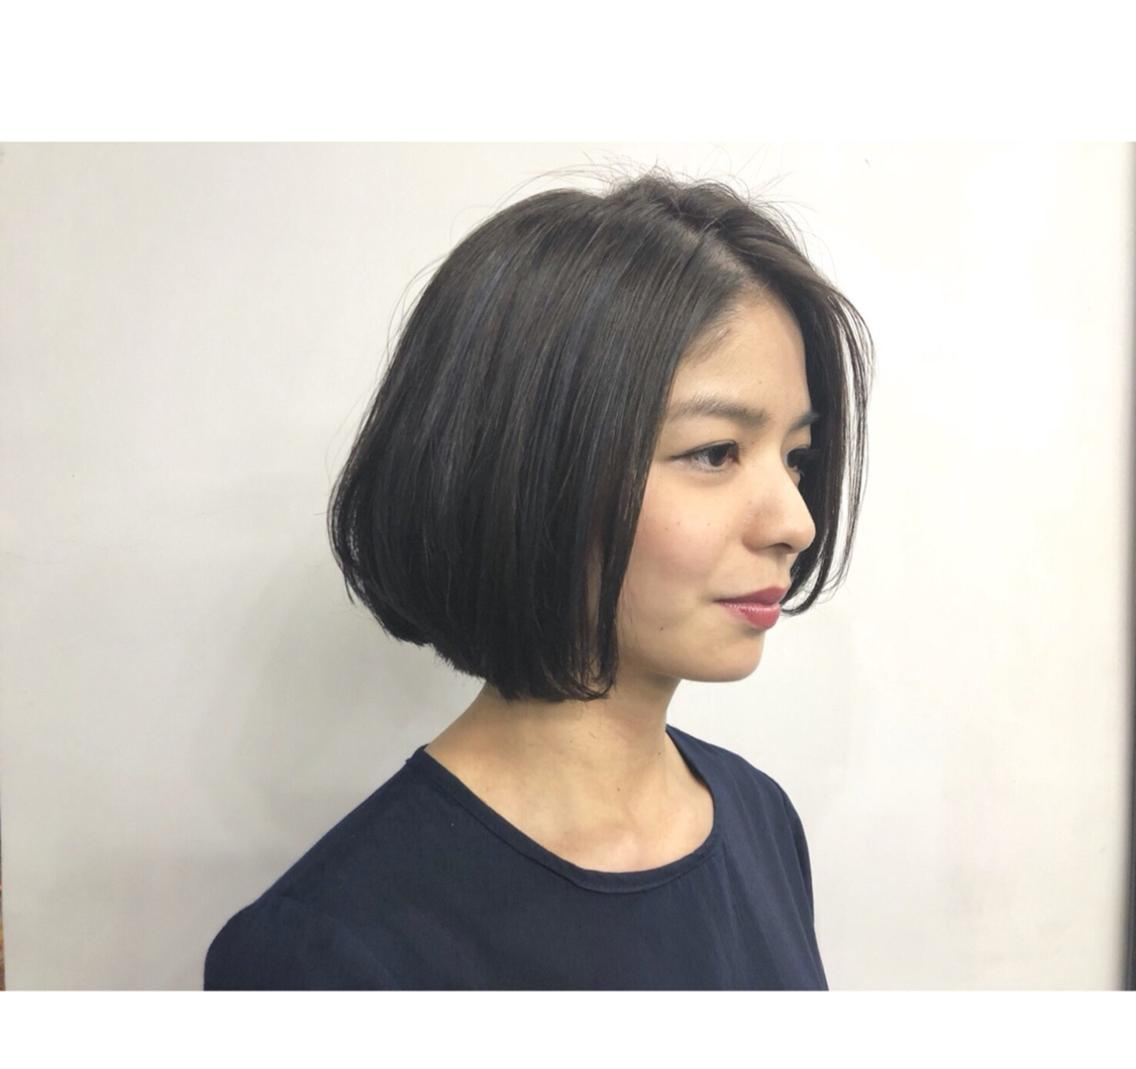 【⭐︎外国人風hair × ラフな抜け感⭐︎】で透明感は抜群❤️口コミ110件突破❤️